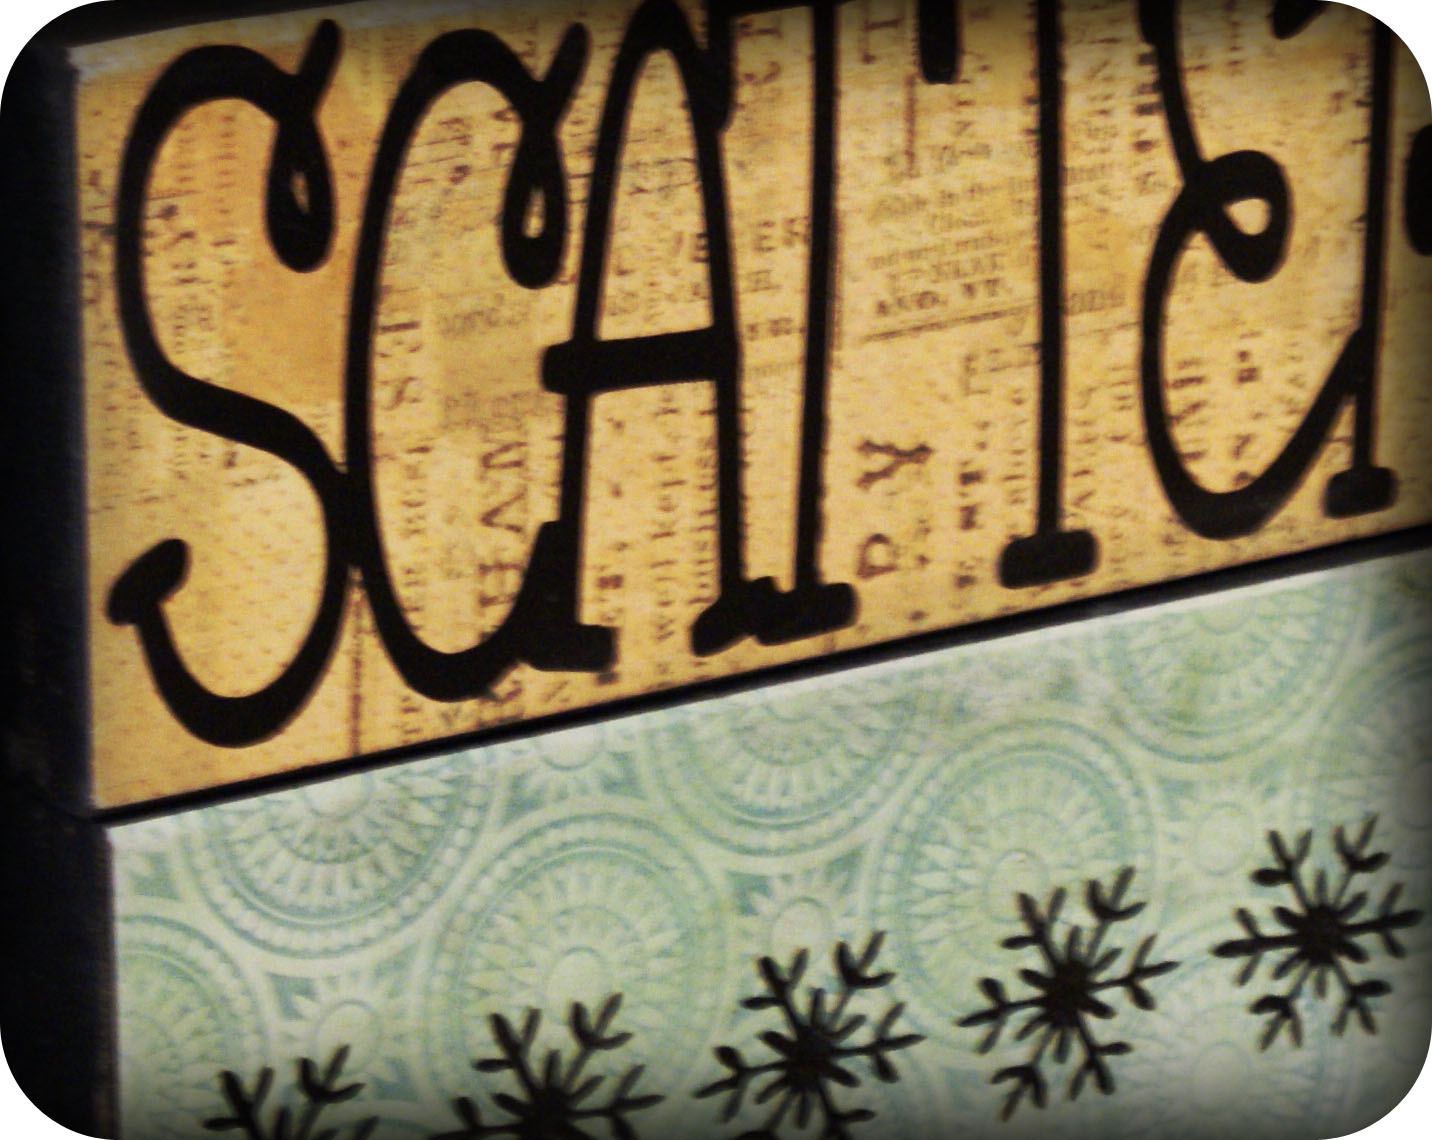 CRICUT CREATE MACHINE GIVEAWAY!!! And Cricut Vinyl Letter Art…